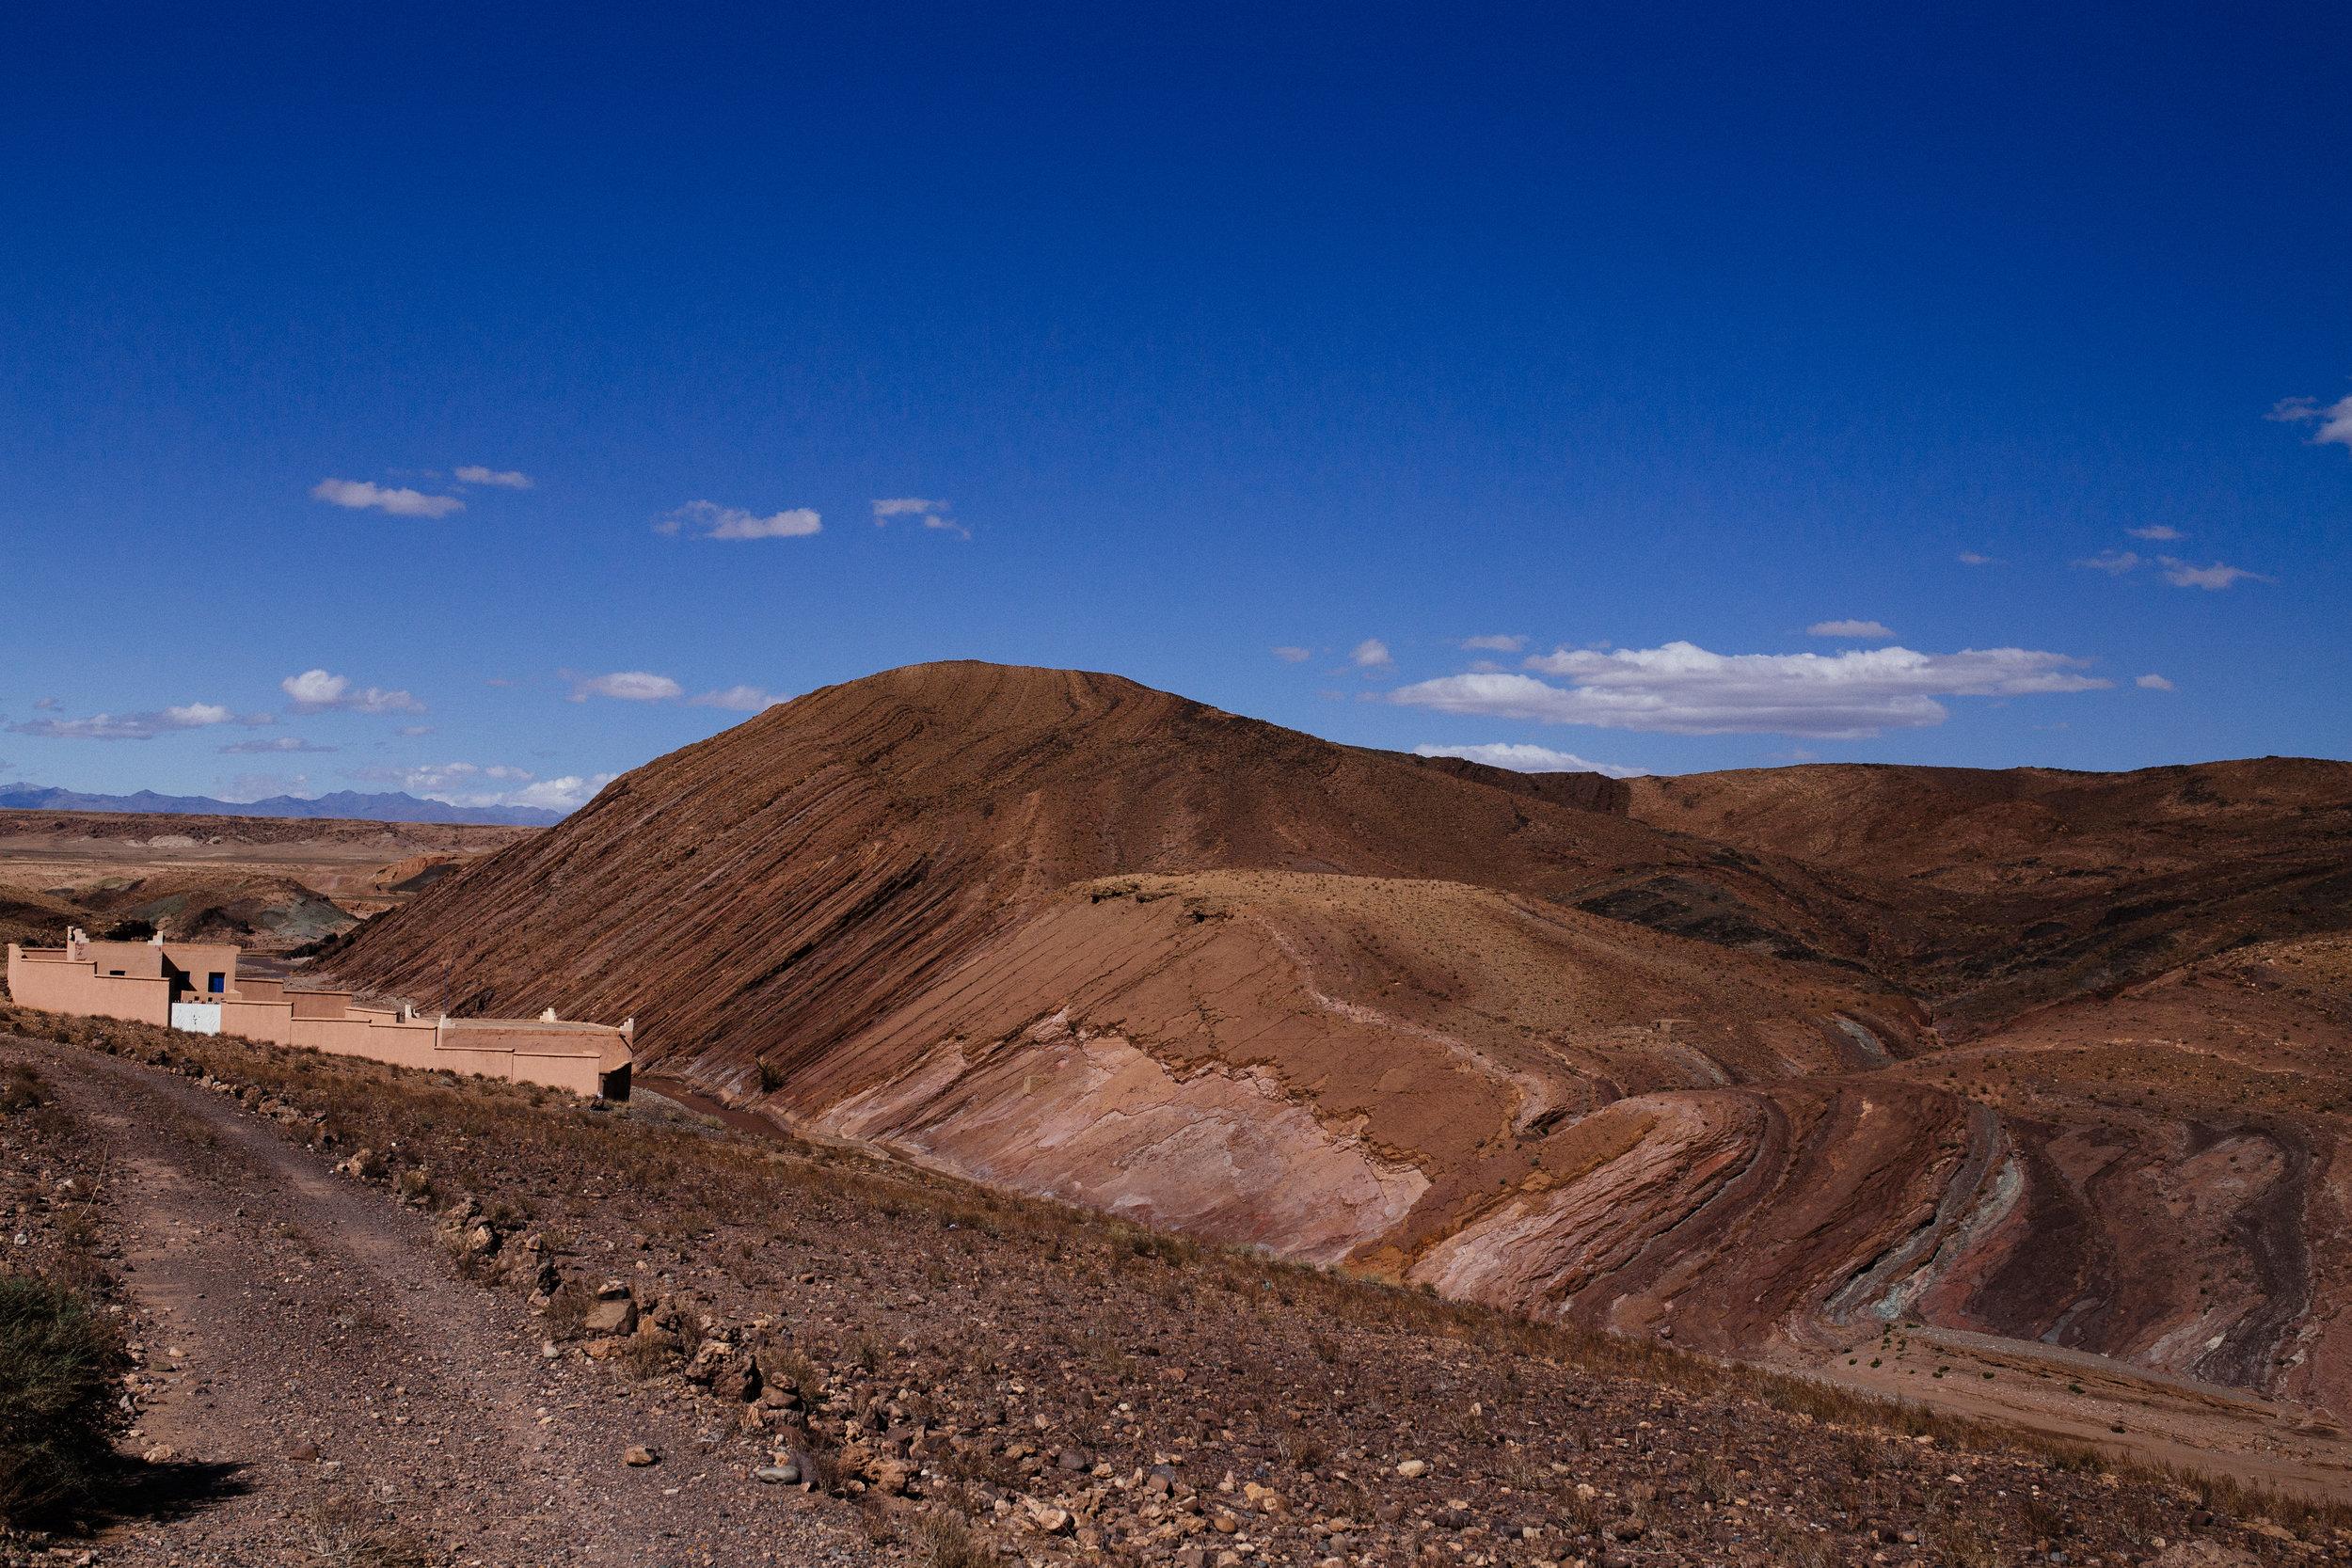 morocco-morocco travel-visit morocco-travel-travel photography-travel photographer-alina mendoza-alina mendoza photography-58.jpg